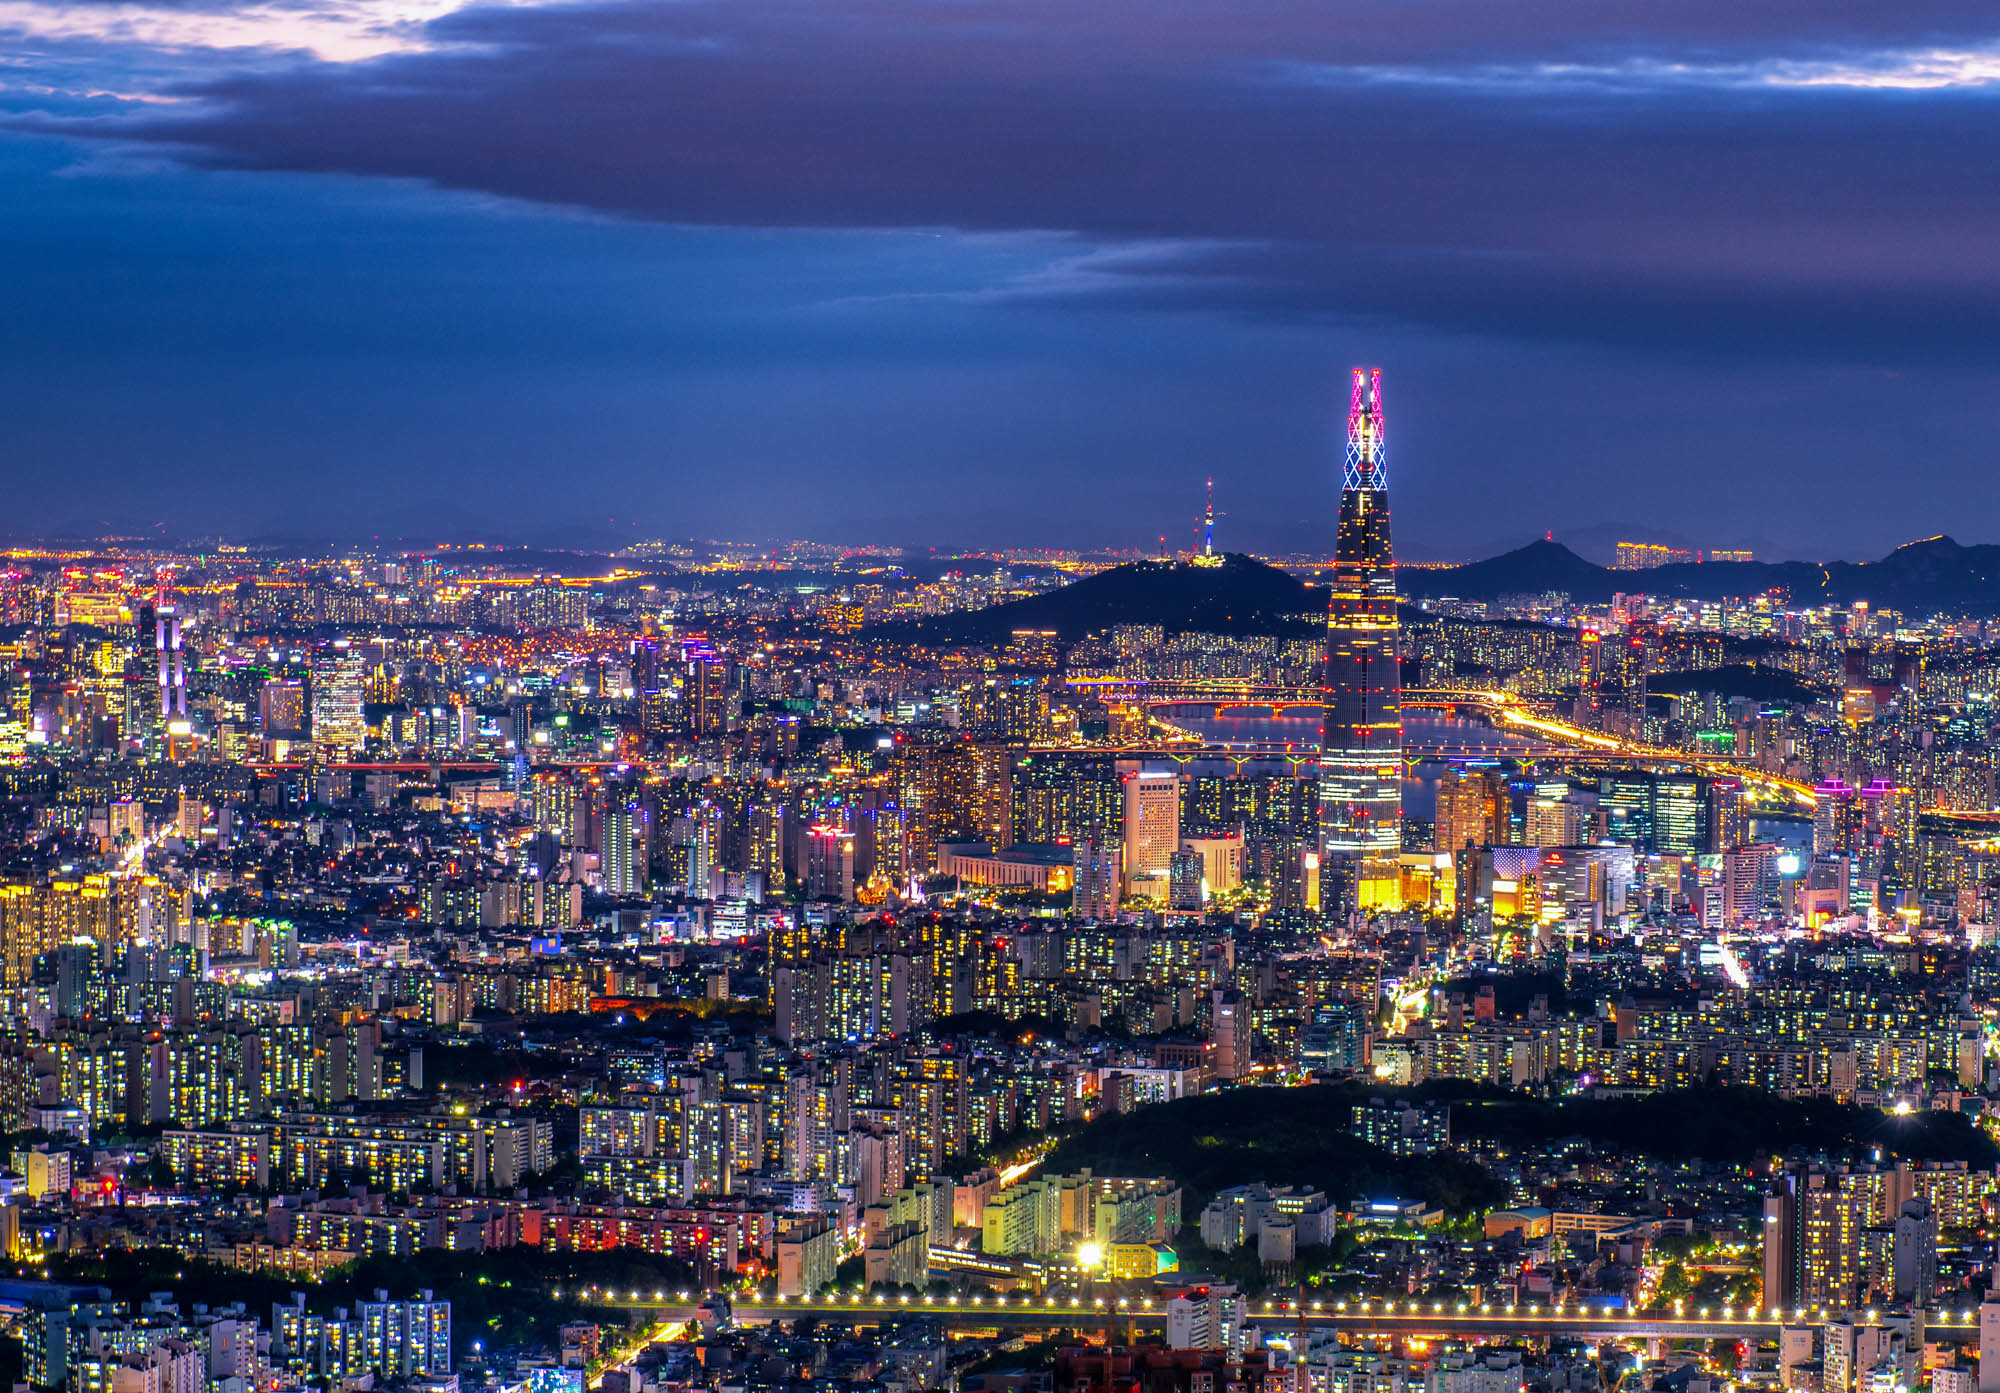 Seoul city at night, South Korea